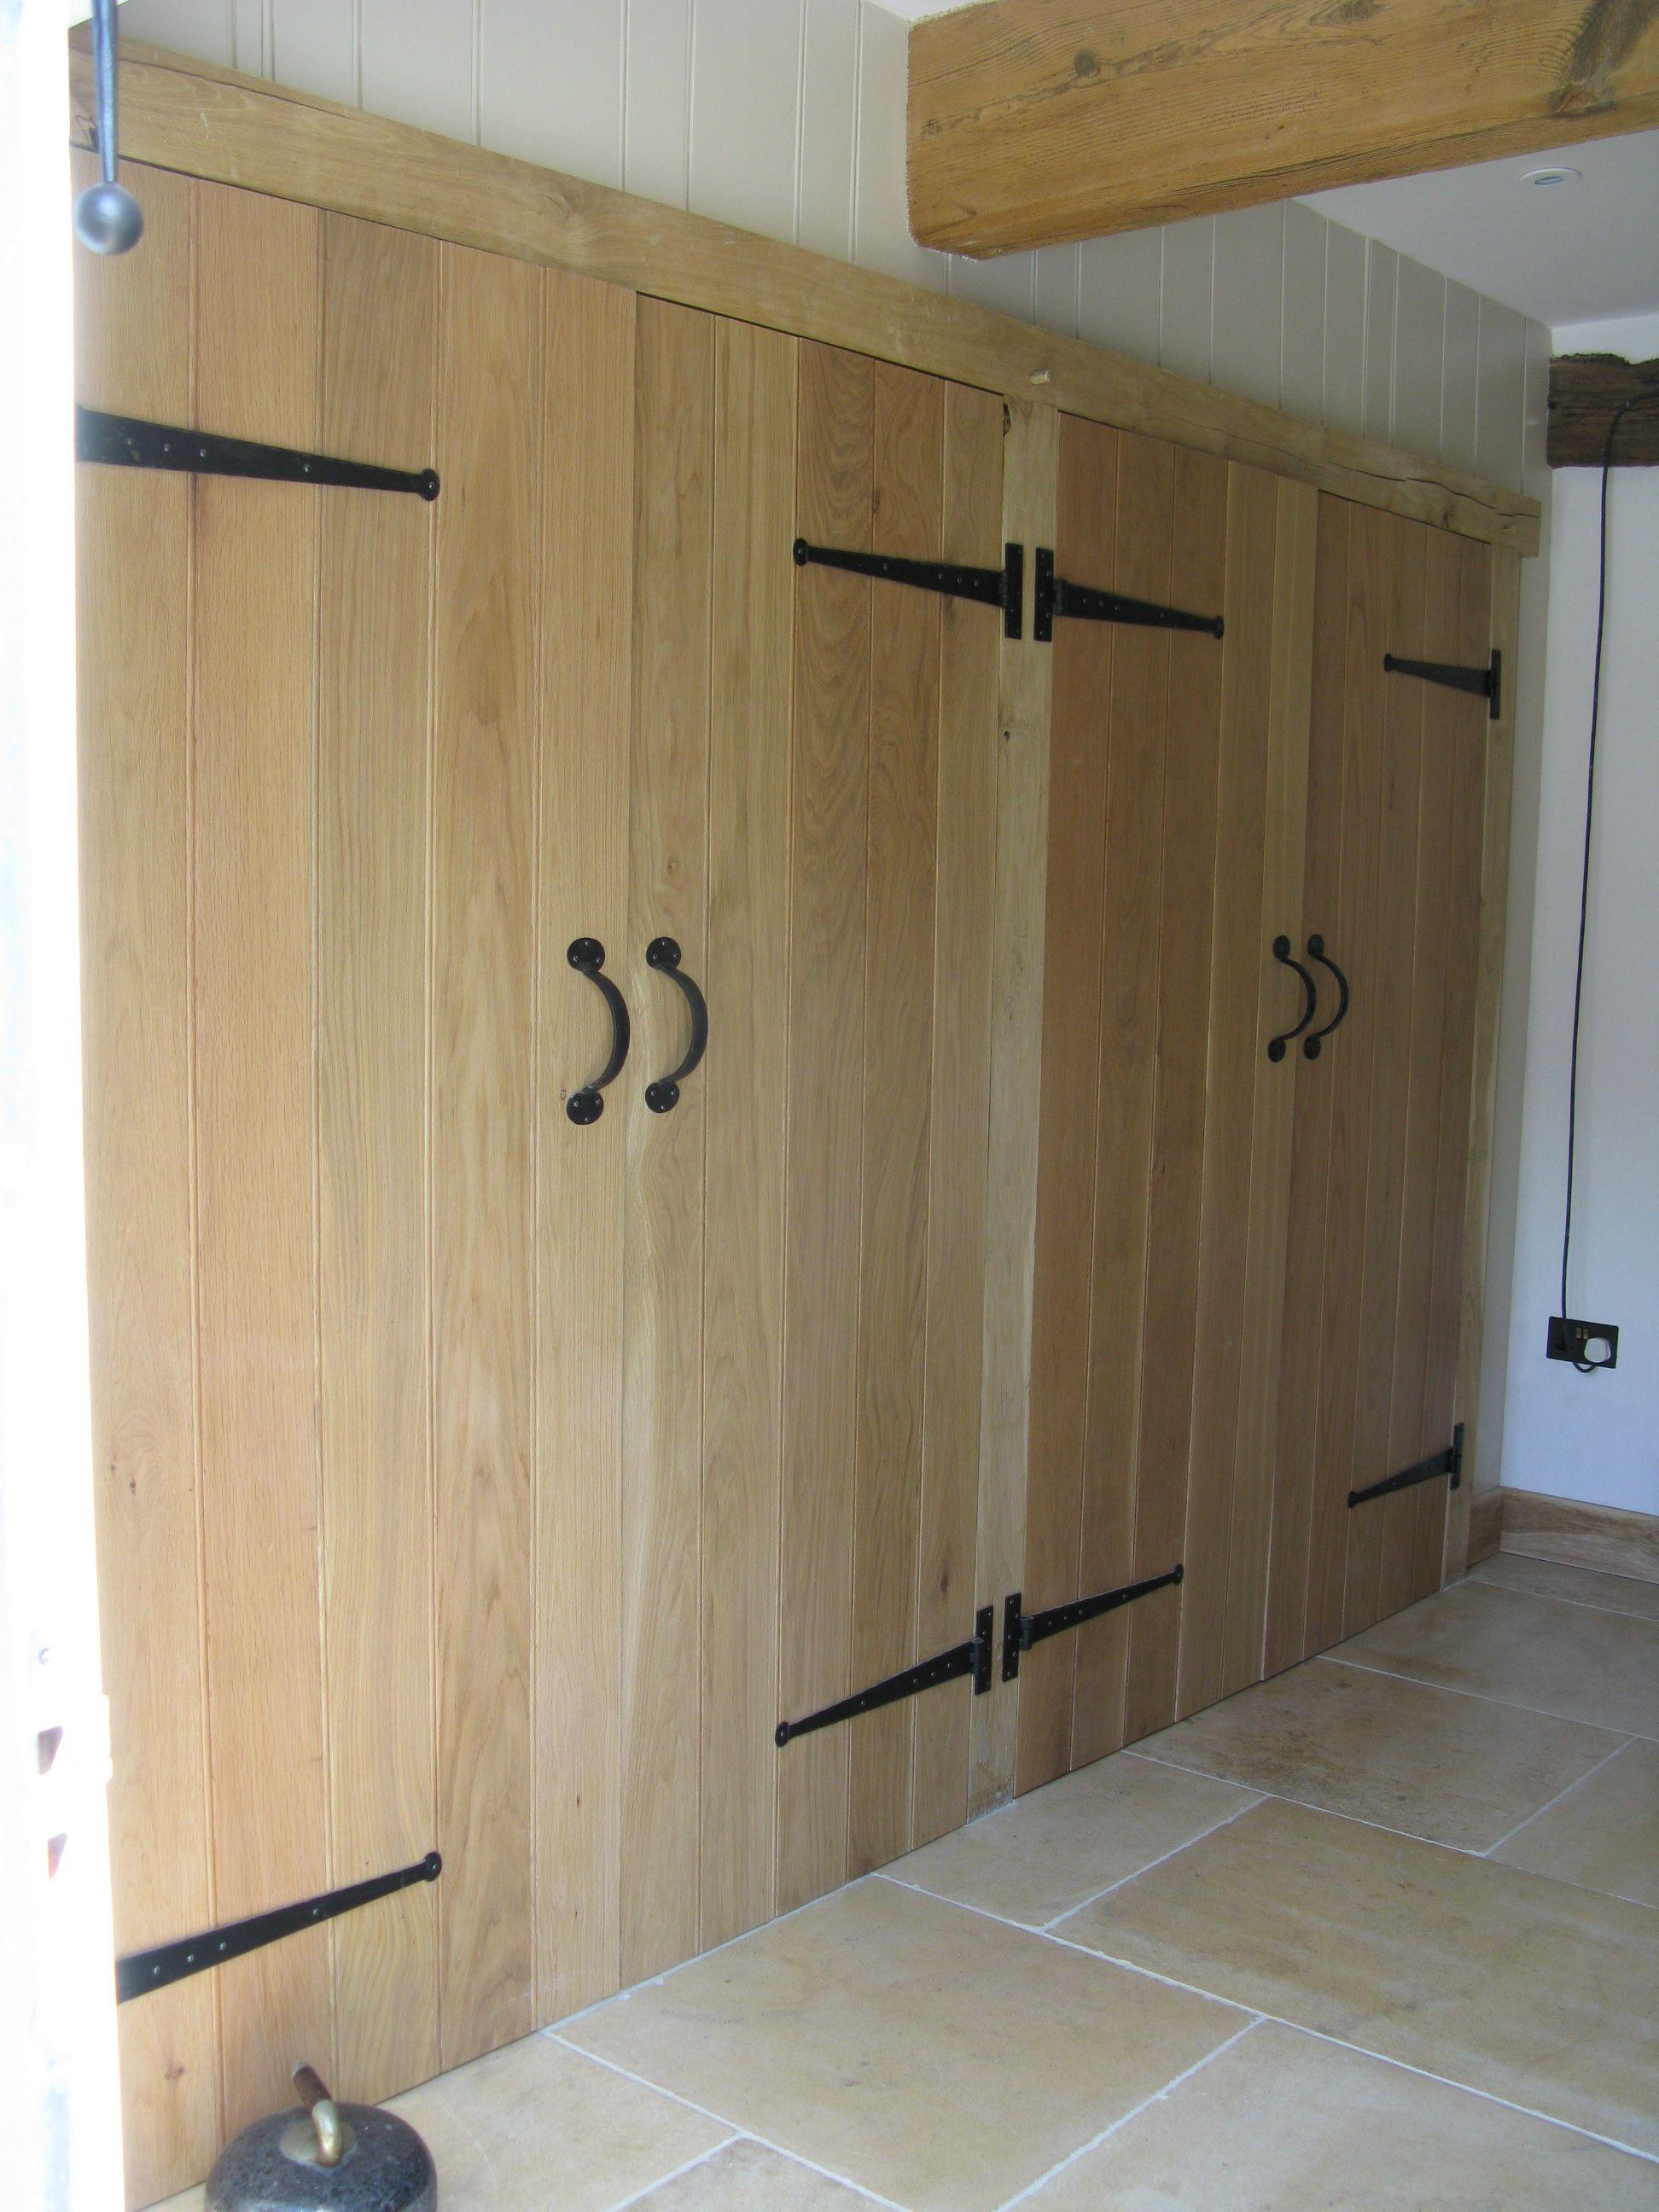 Ledge and brace oak doors - Solid Oak Ledge And Optional Brace Doors Converted Into Useful Cupboard Storage Ledge